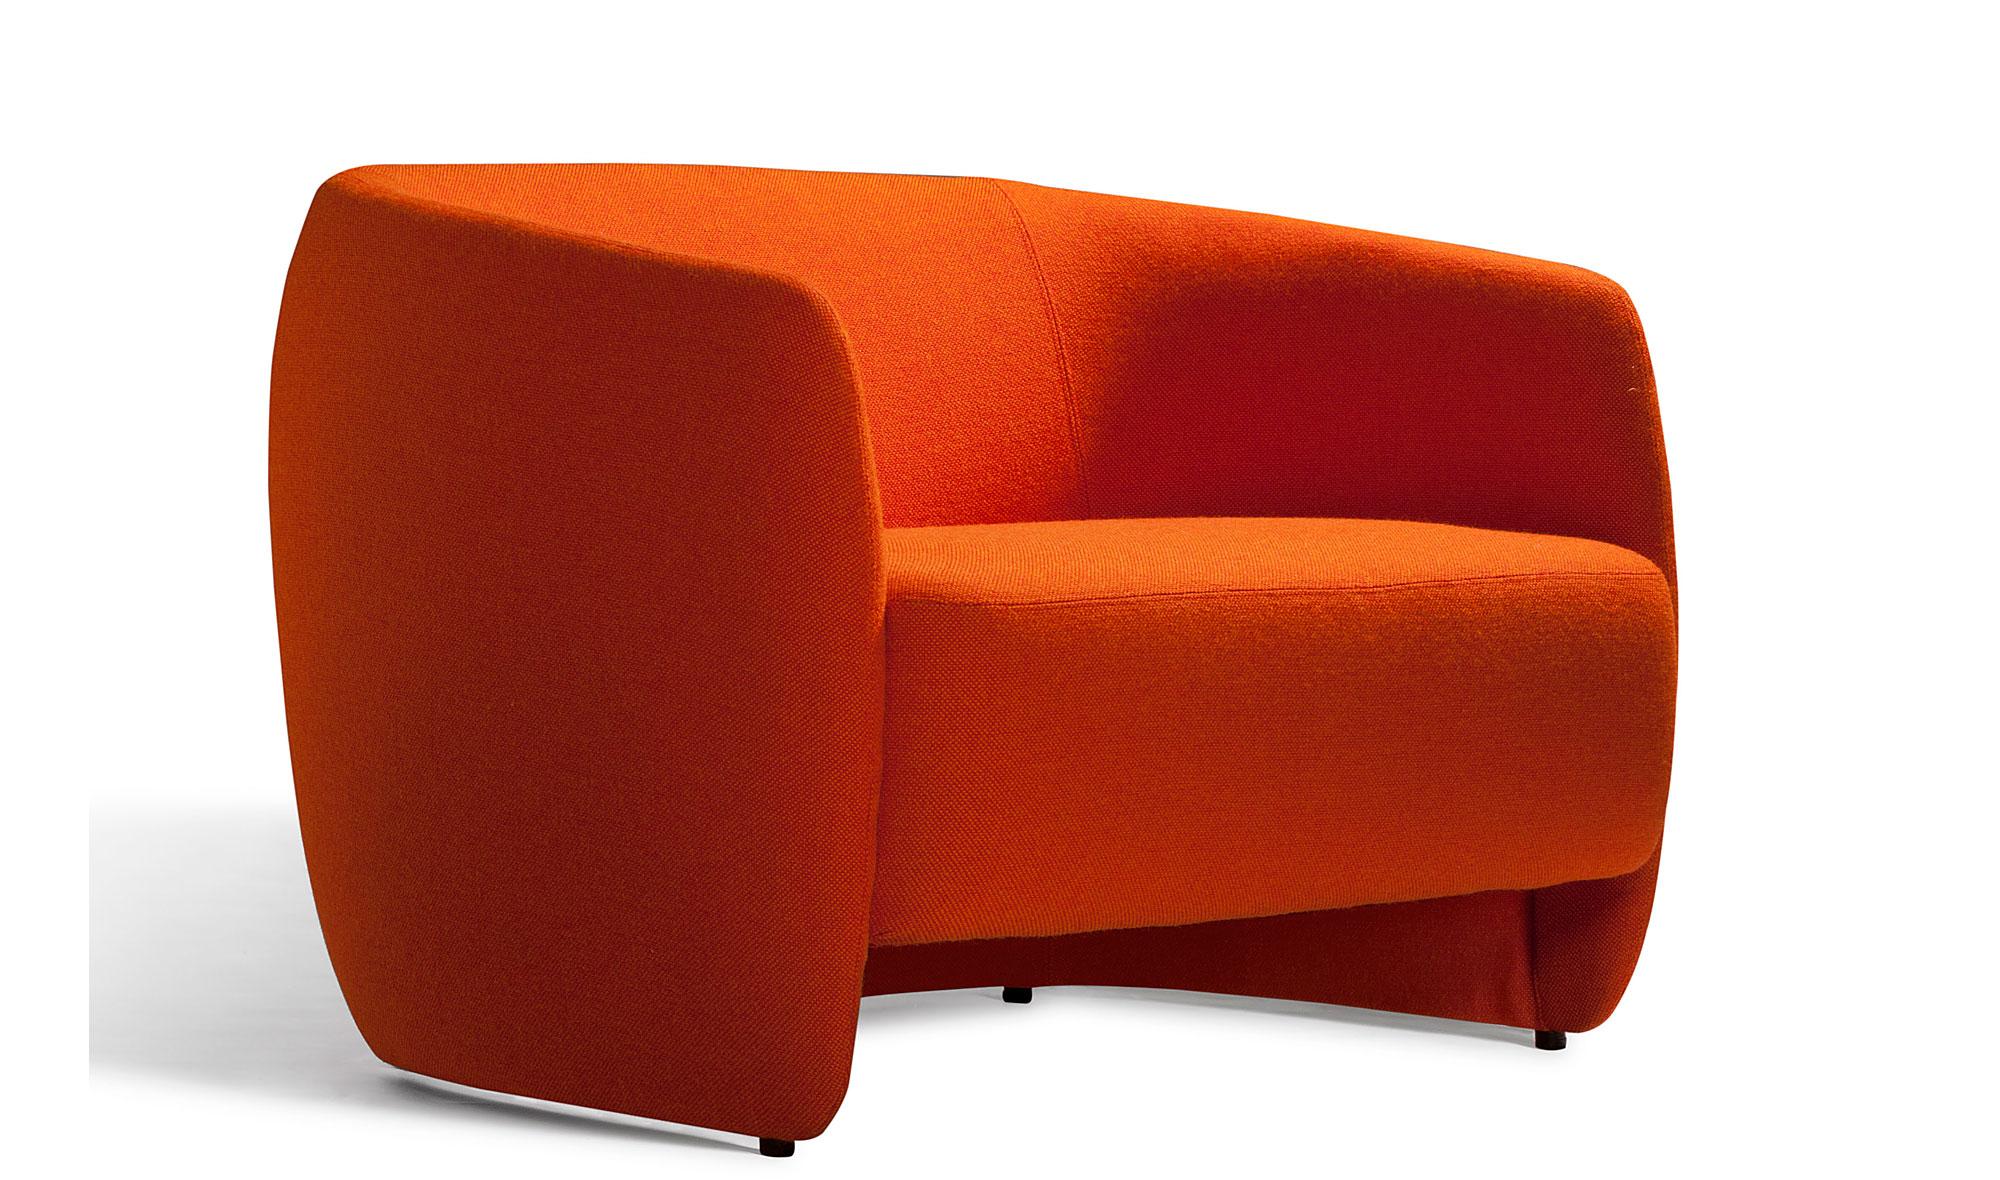 Butaca Moderna Lounge De Lujo En Portobellodeluxe Com Tu Tienda  # Muebles Butacas Modernas